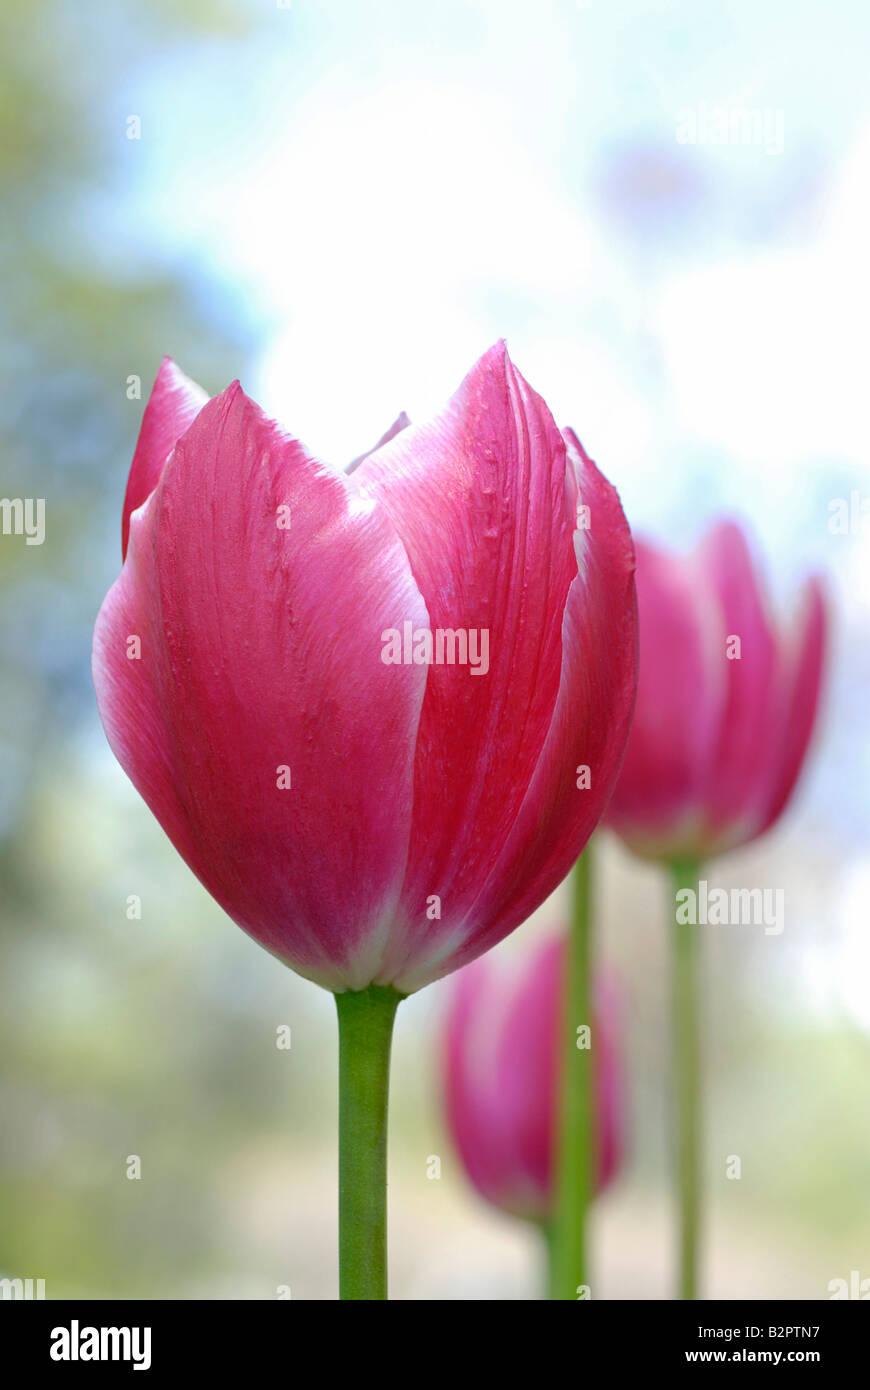 Pink Tulips - Stock Image